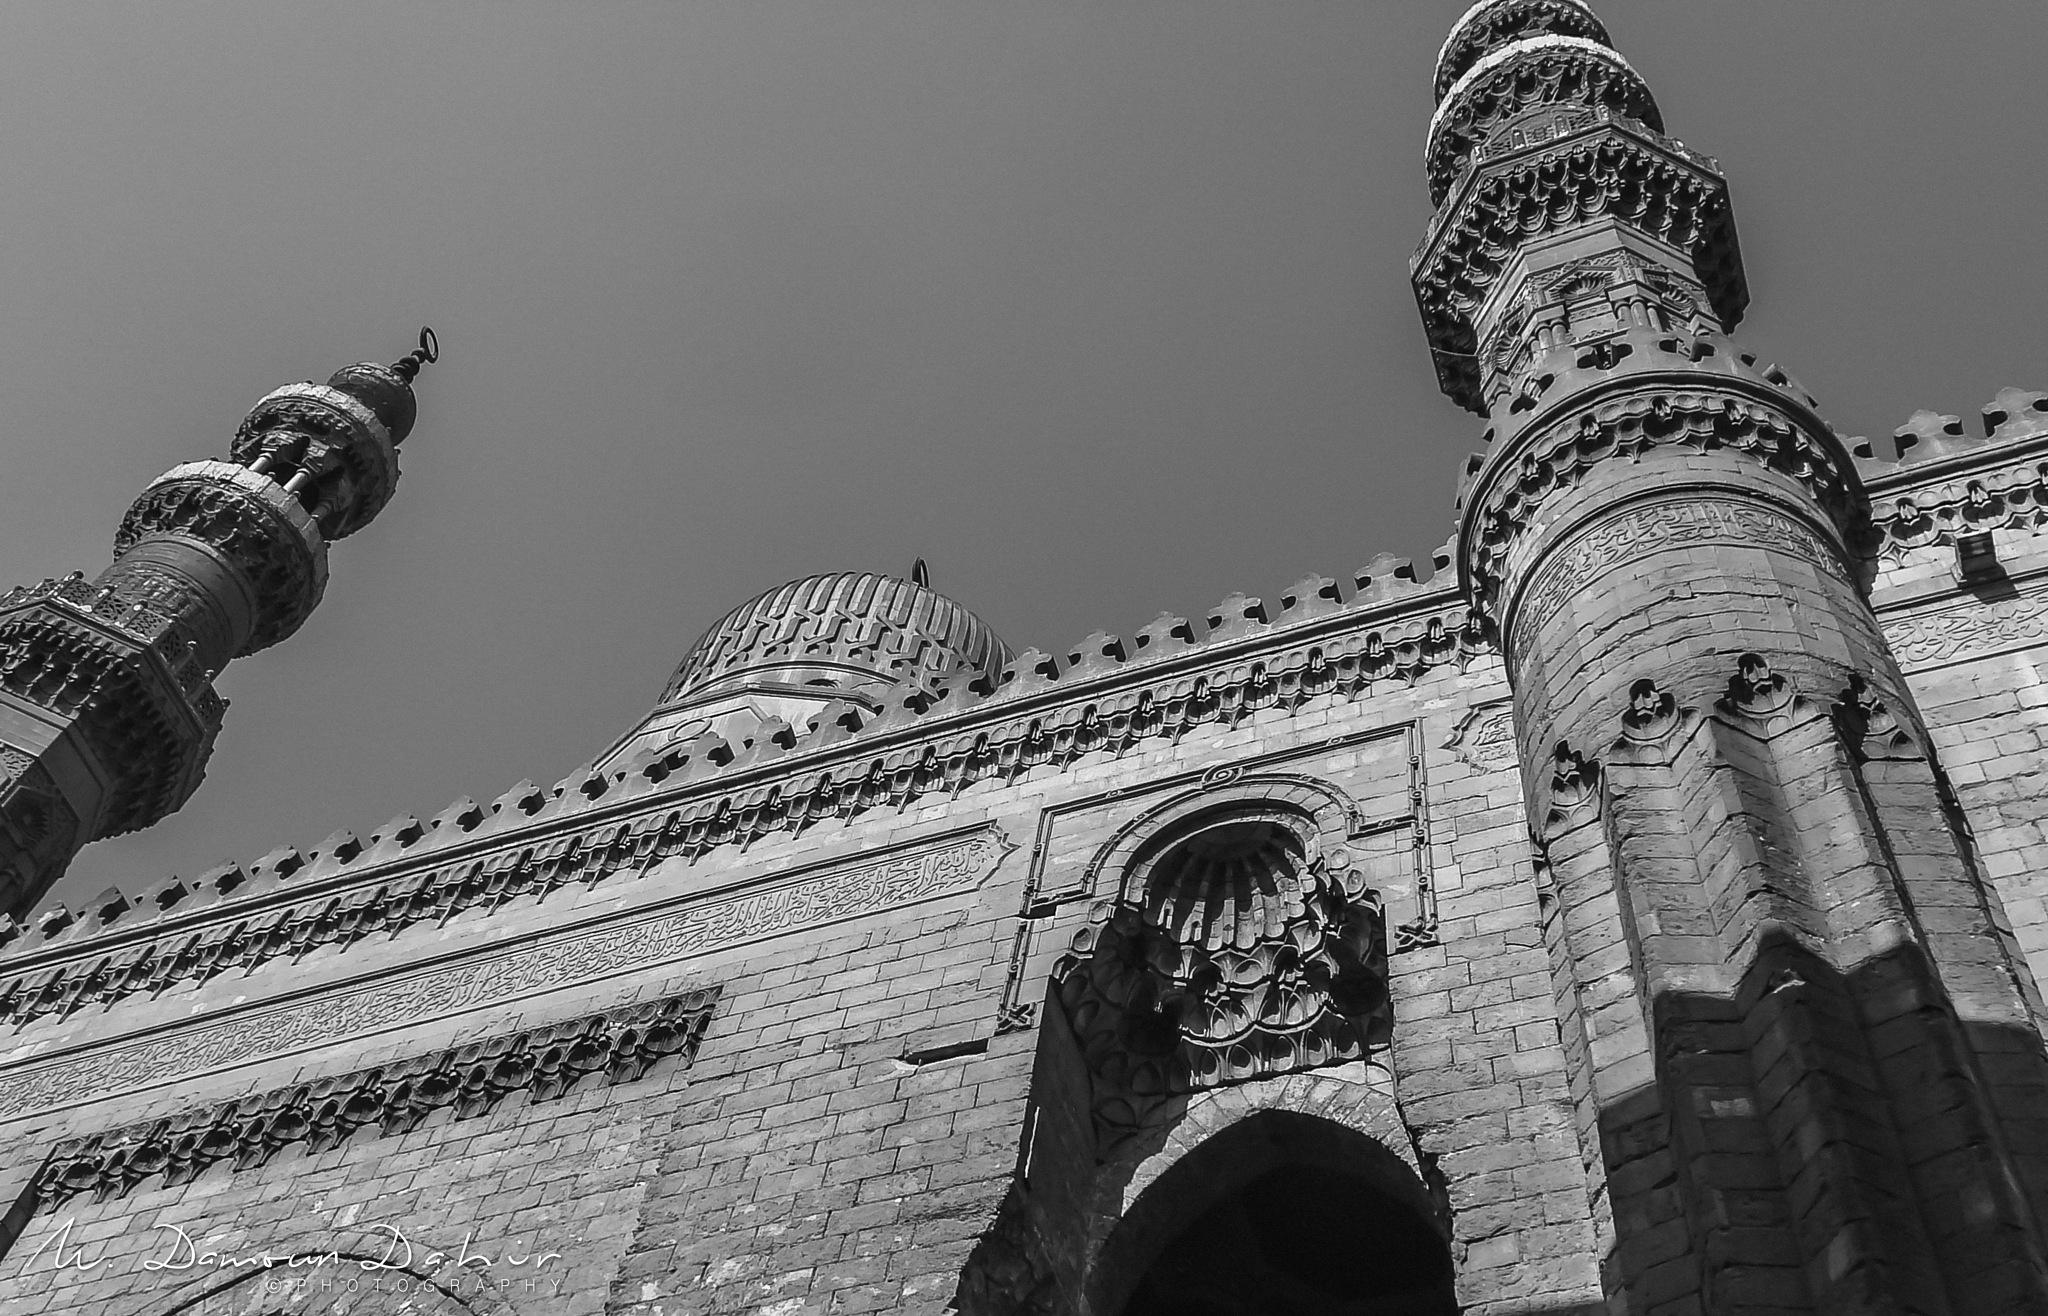 The Balance - Mosque-Madrassa of Sultan Hassan, Cairo, Egypt by Mohammad Damoun Dahir